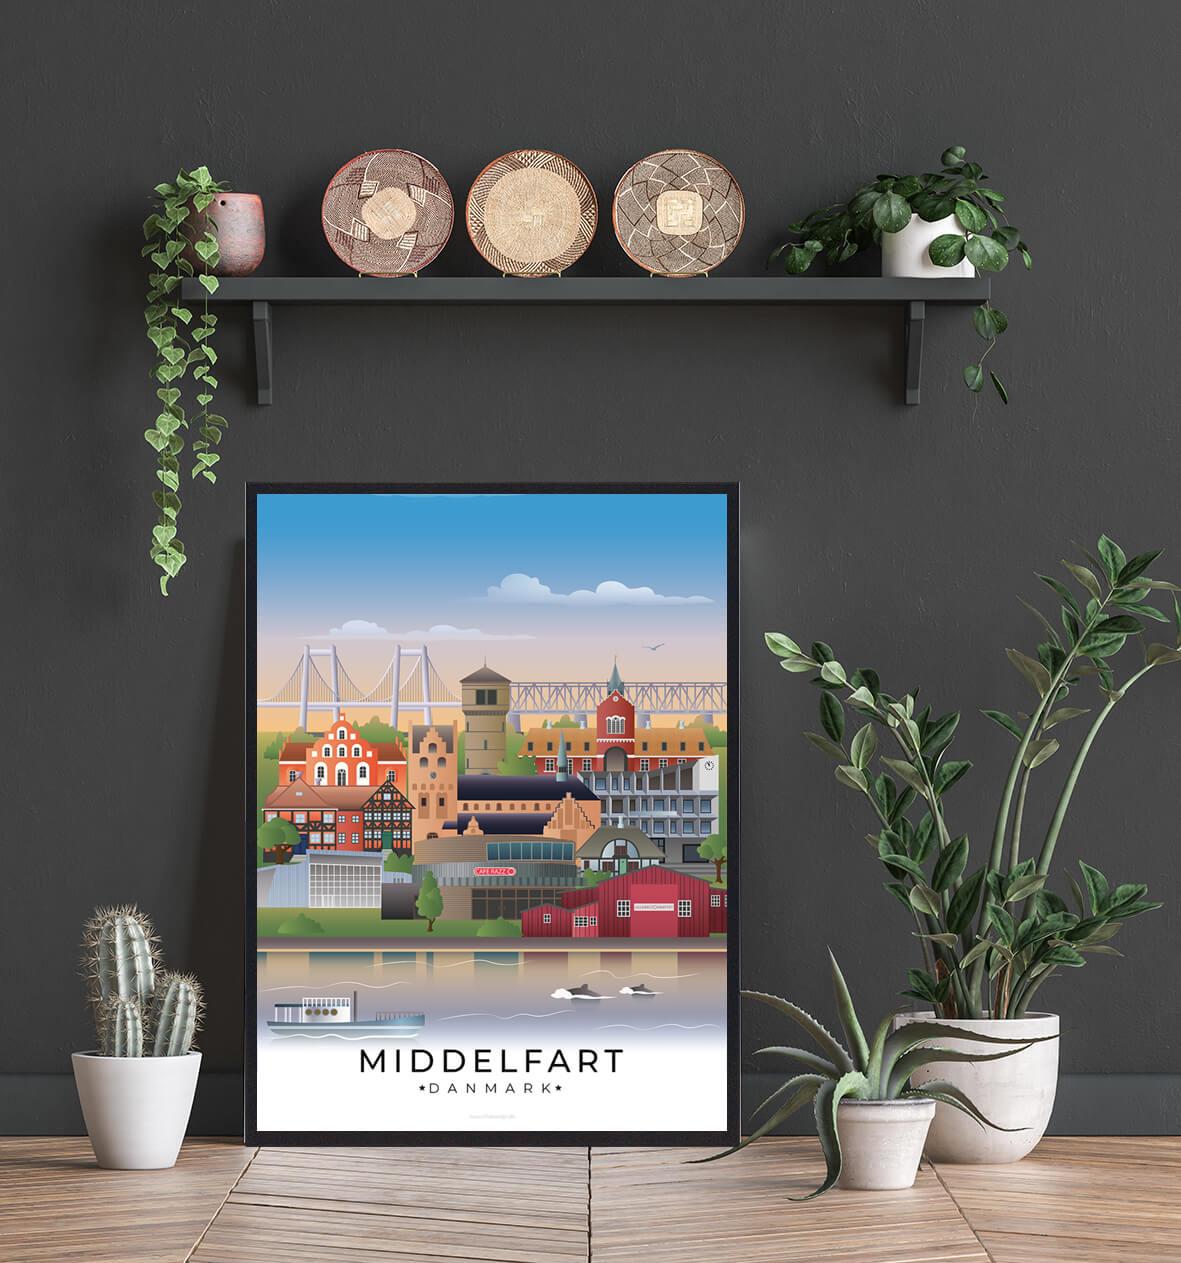 Middelfart-plakat-boligen-1